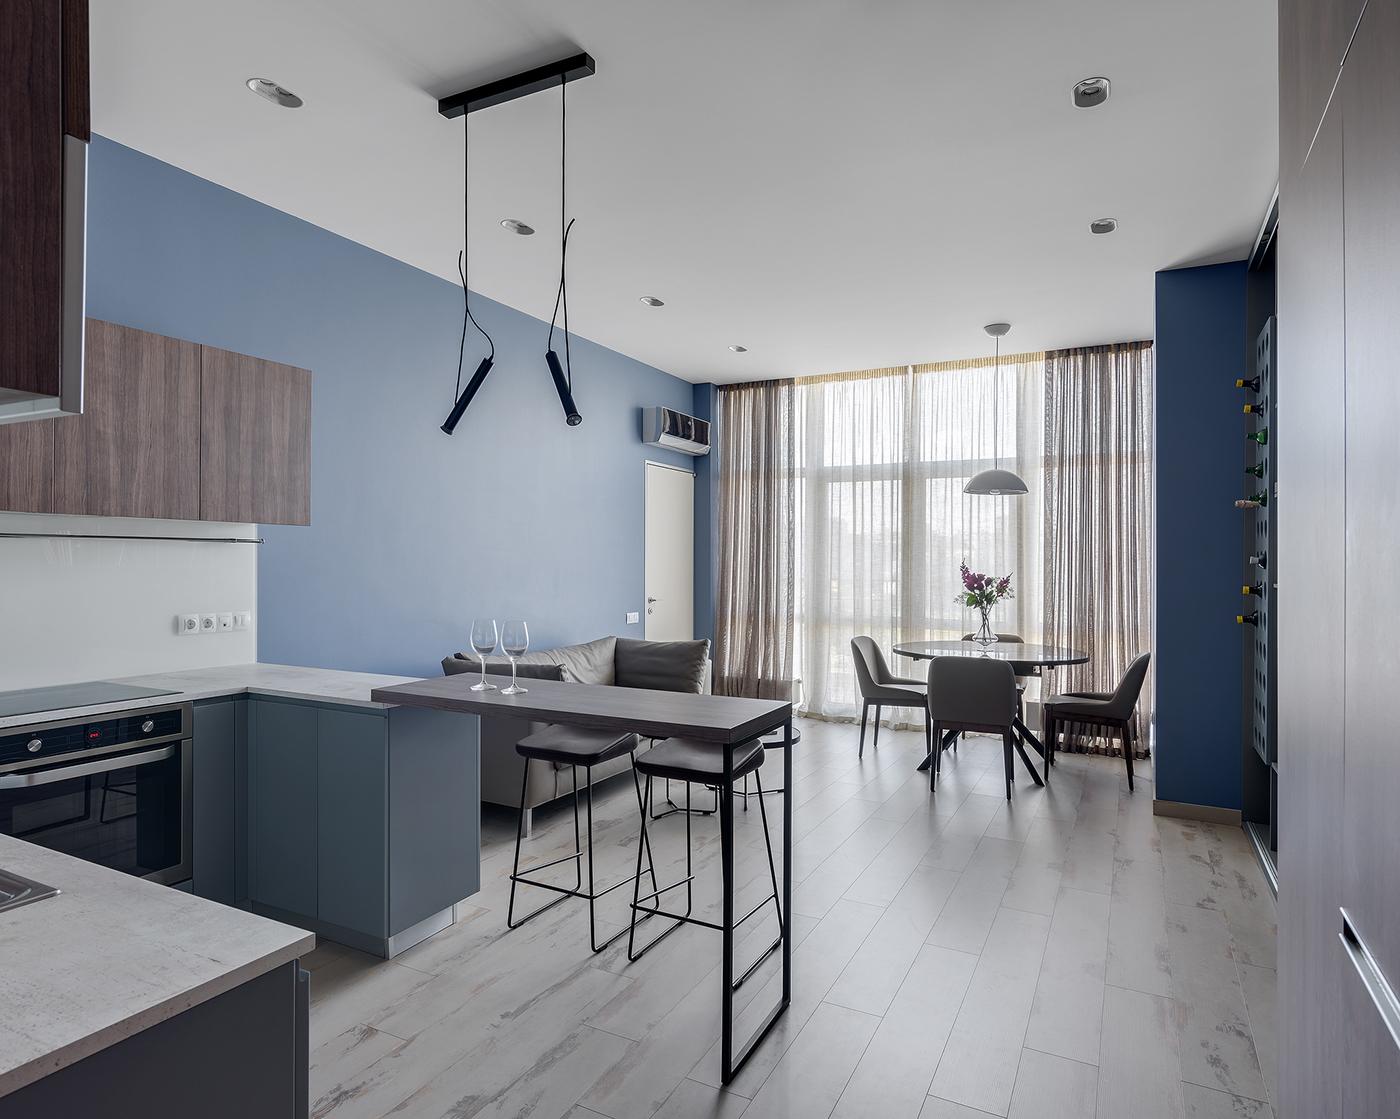 Single bedroom apartment on Behance